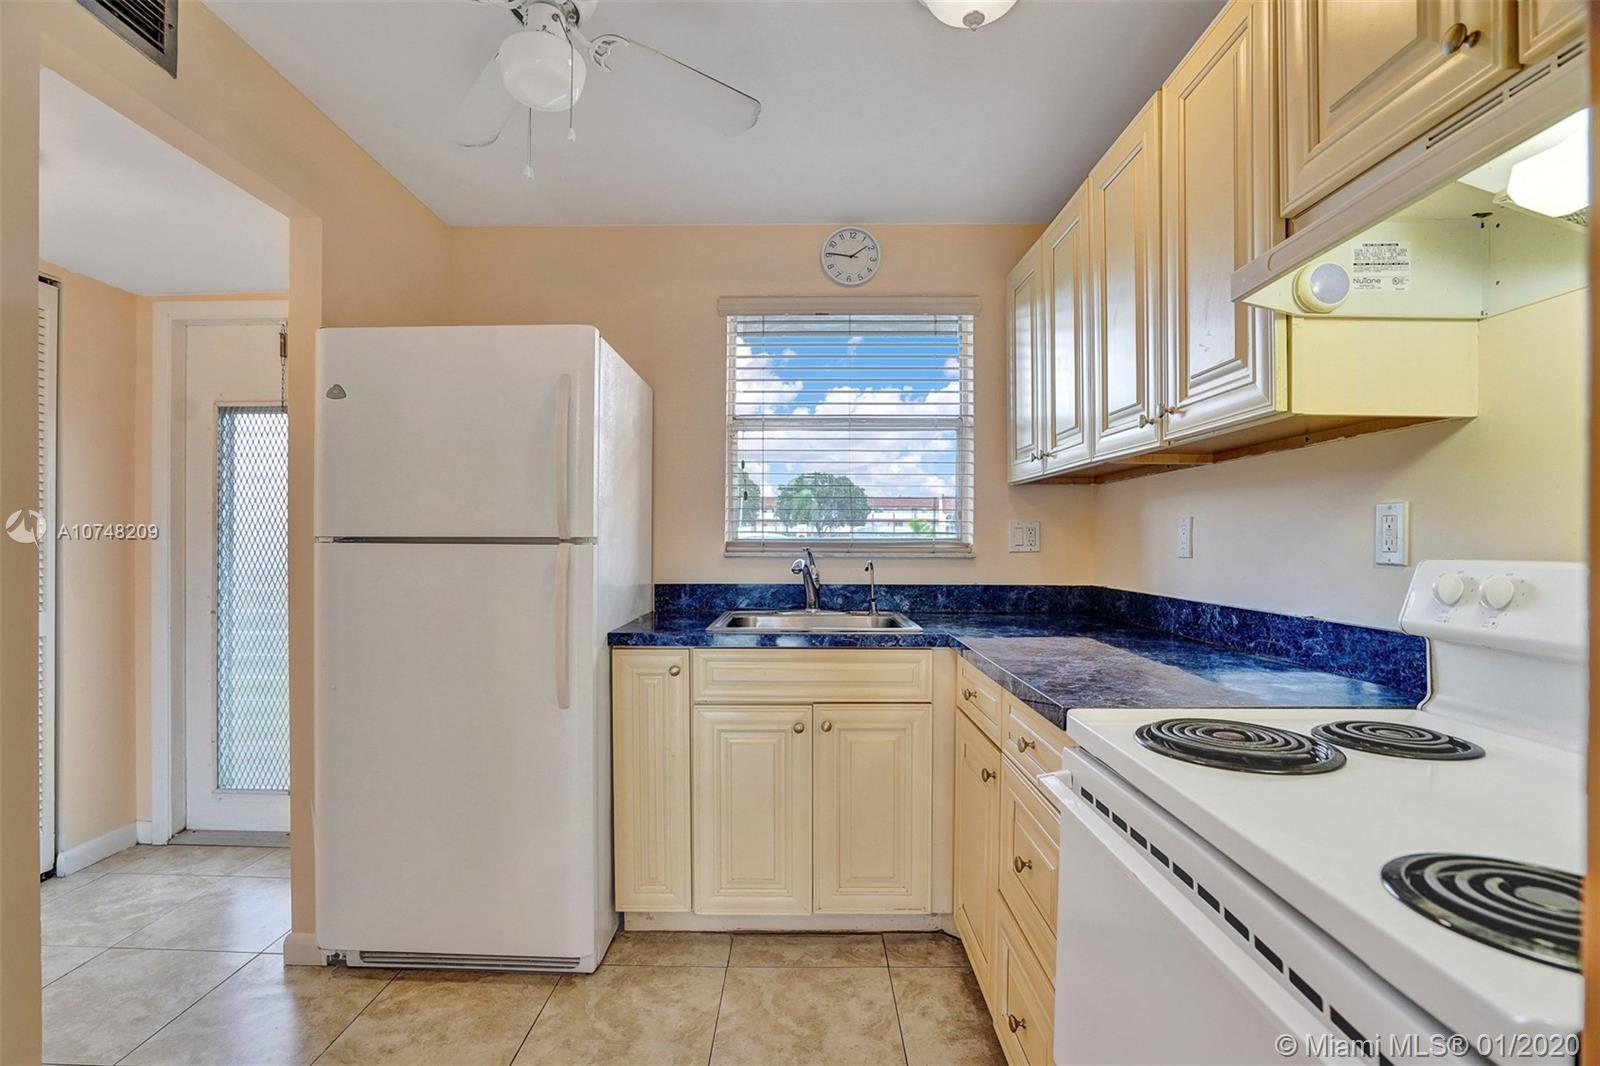 2721 N Pine Island Rd #106 For Sale A10748209, FL